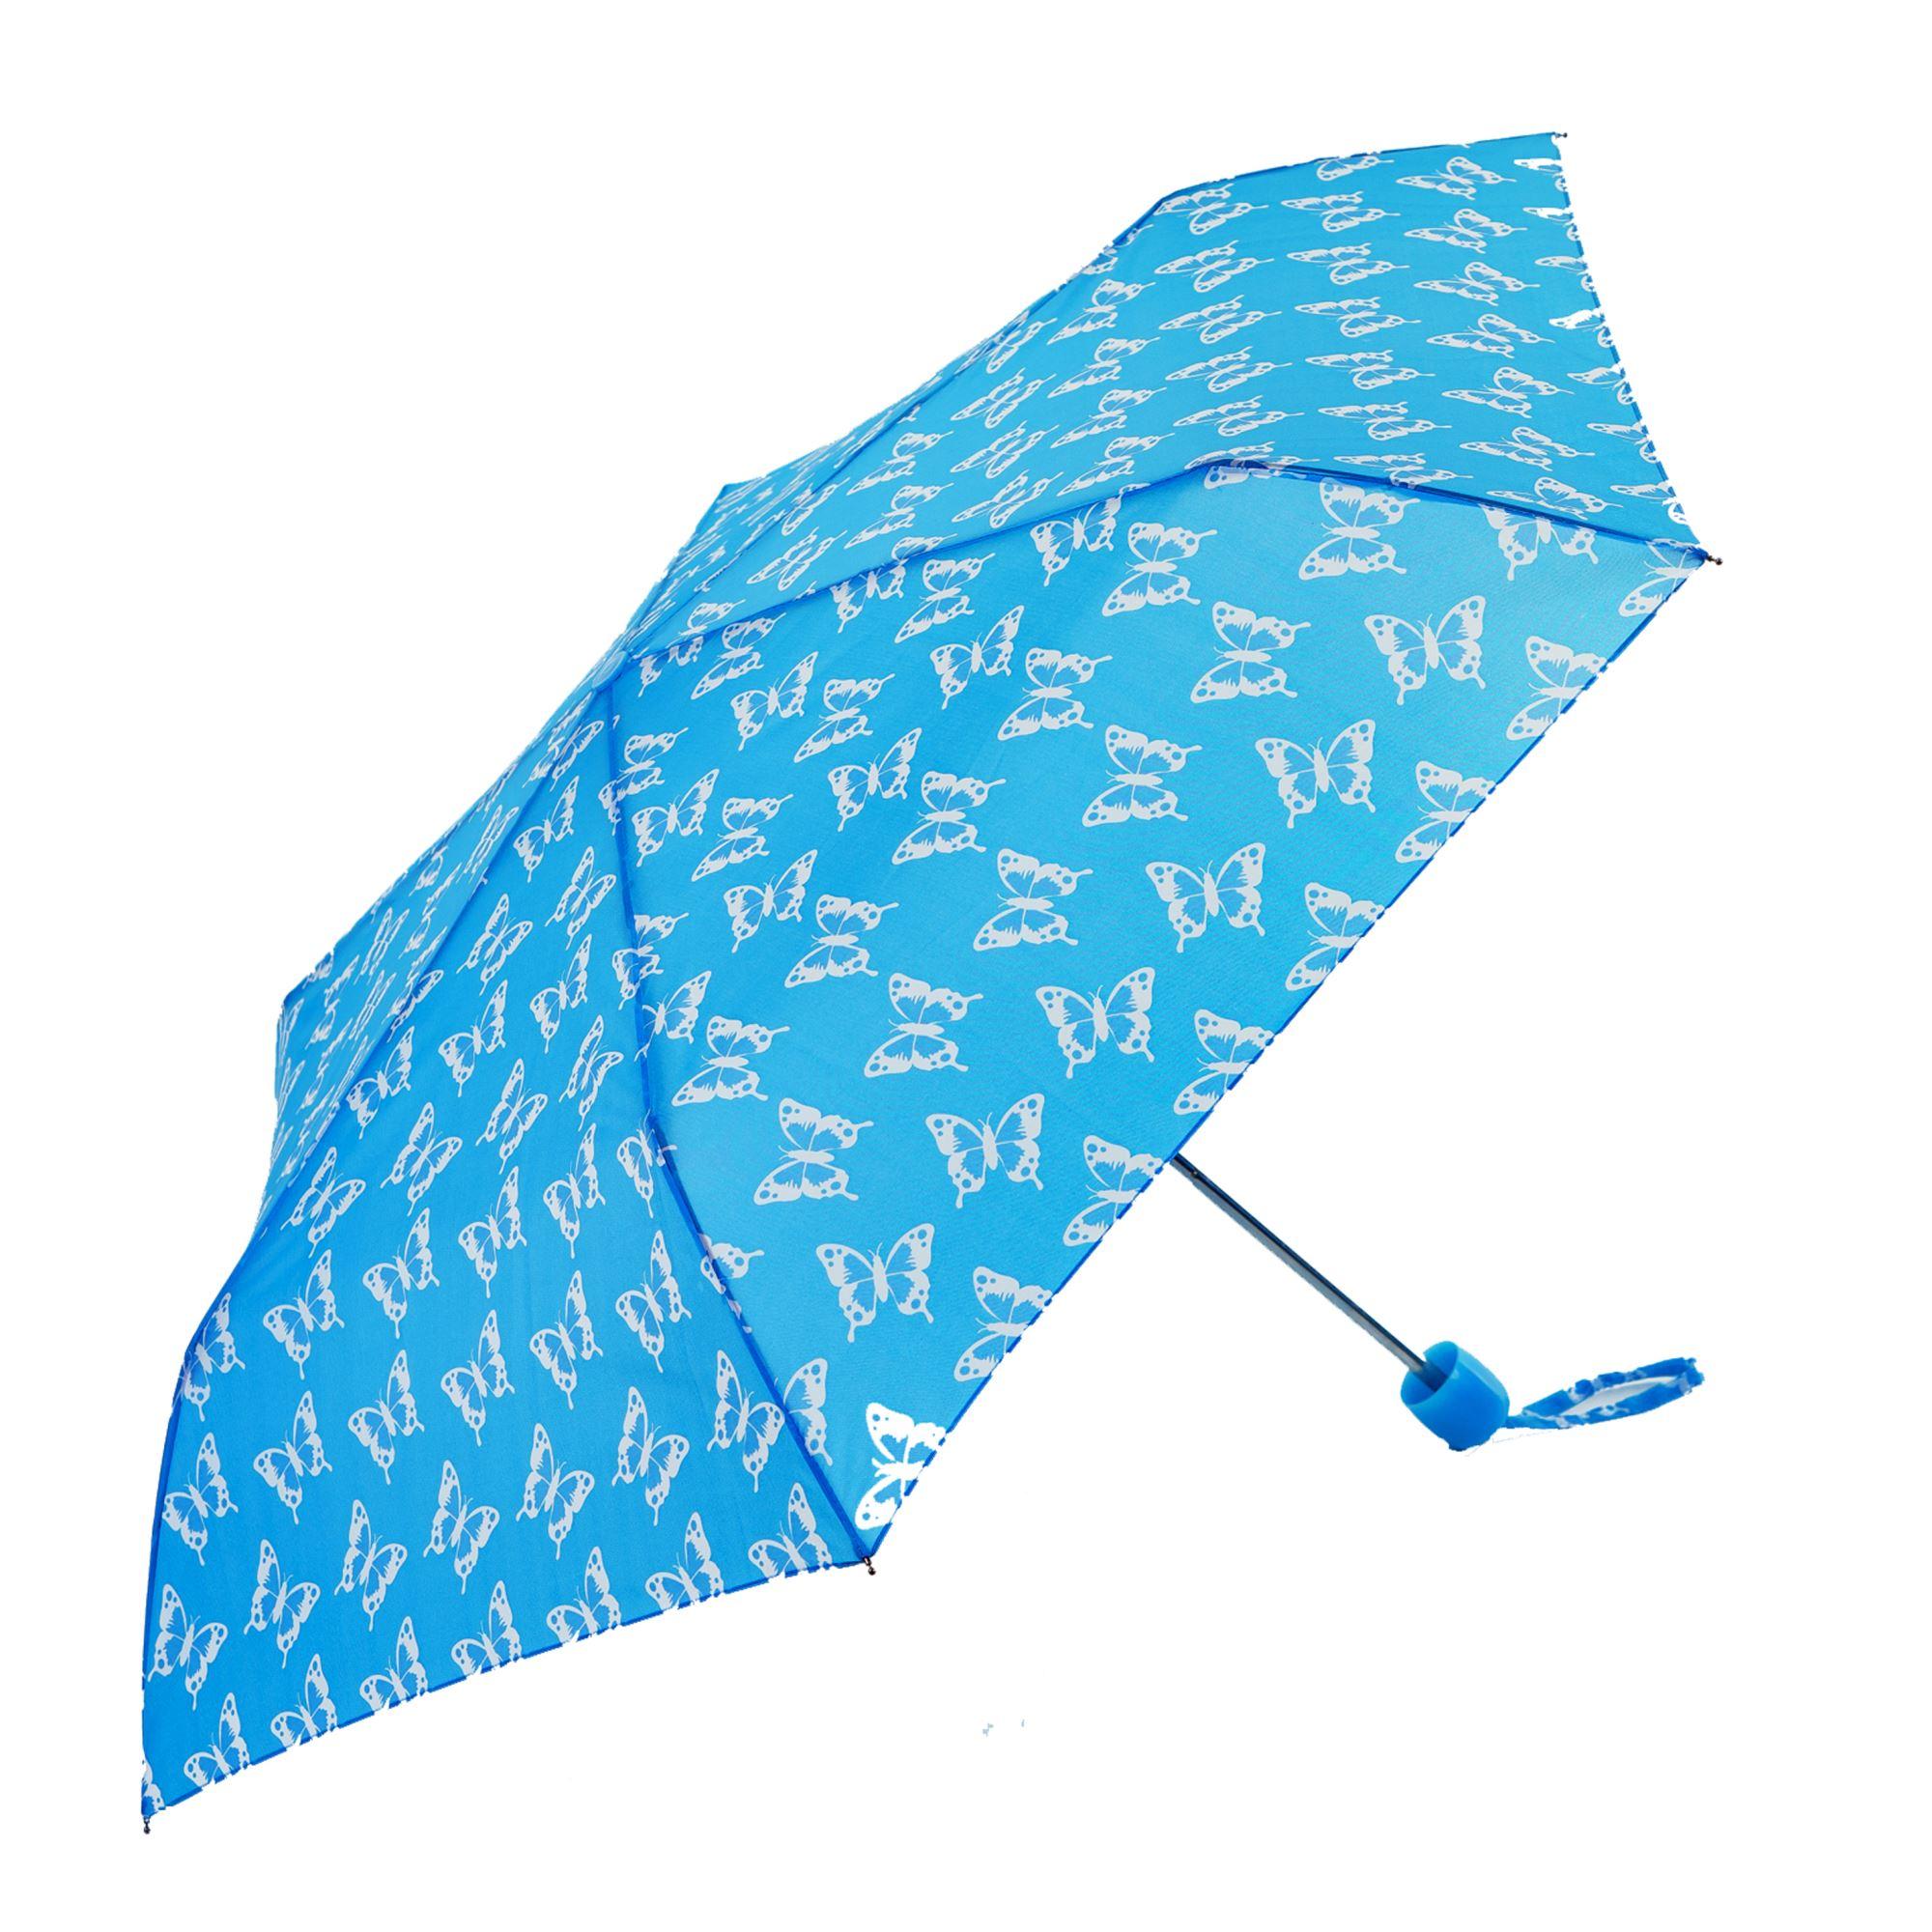 wholesale umbrellas uk umbrella suppliers fashion umbrellas